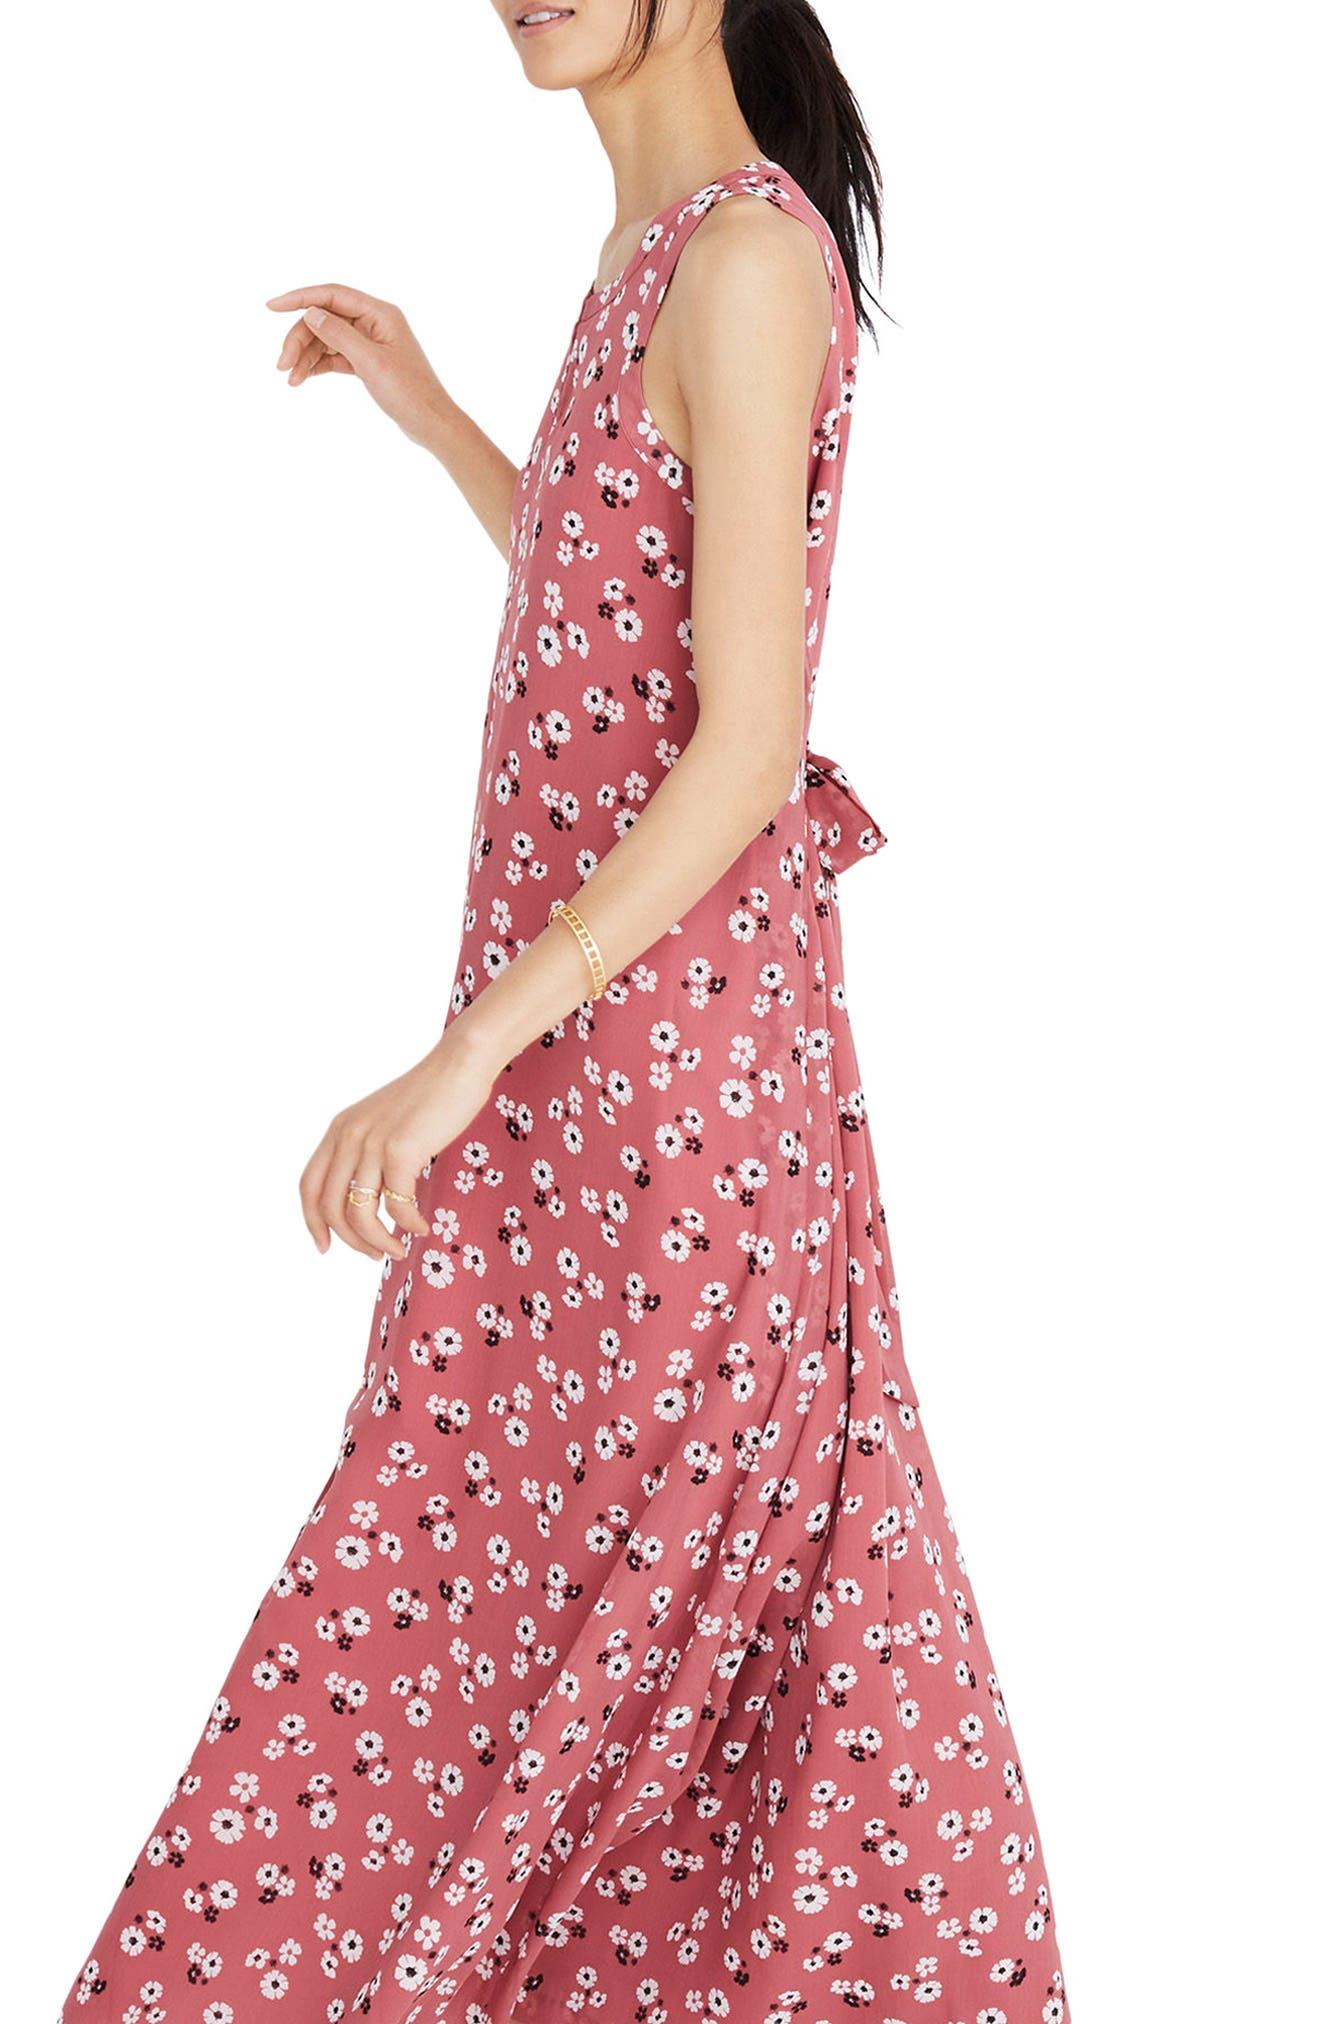 Daisy Tie Waist Maxi Dress,                             Alternate thumbnail 3, color,                             650